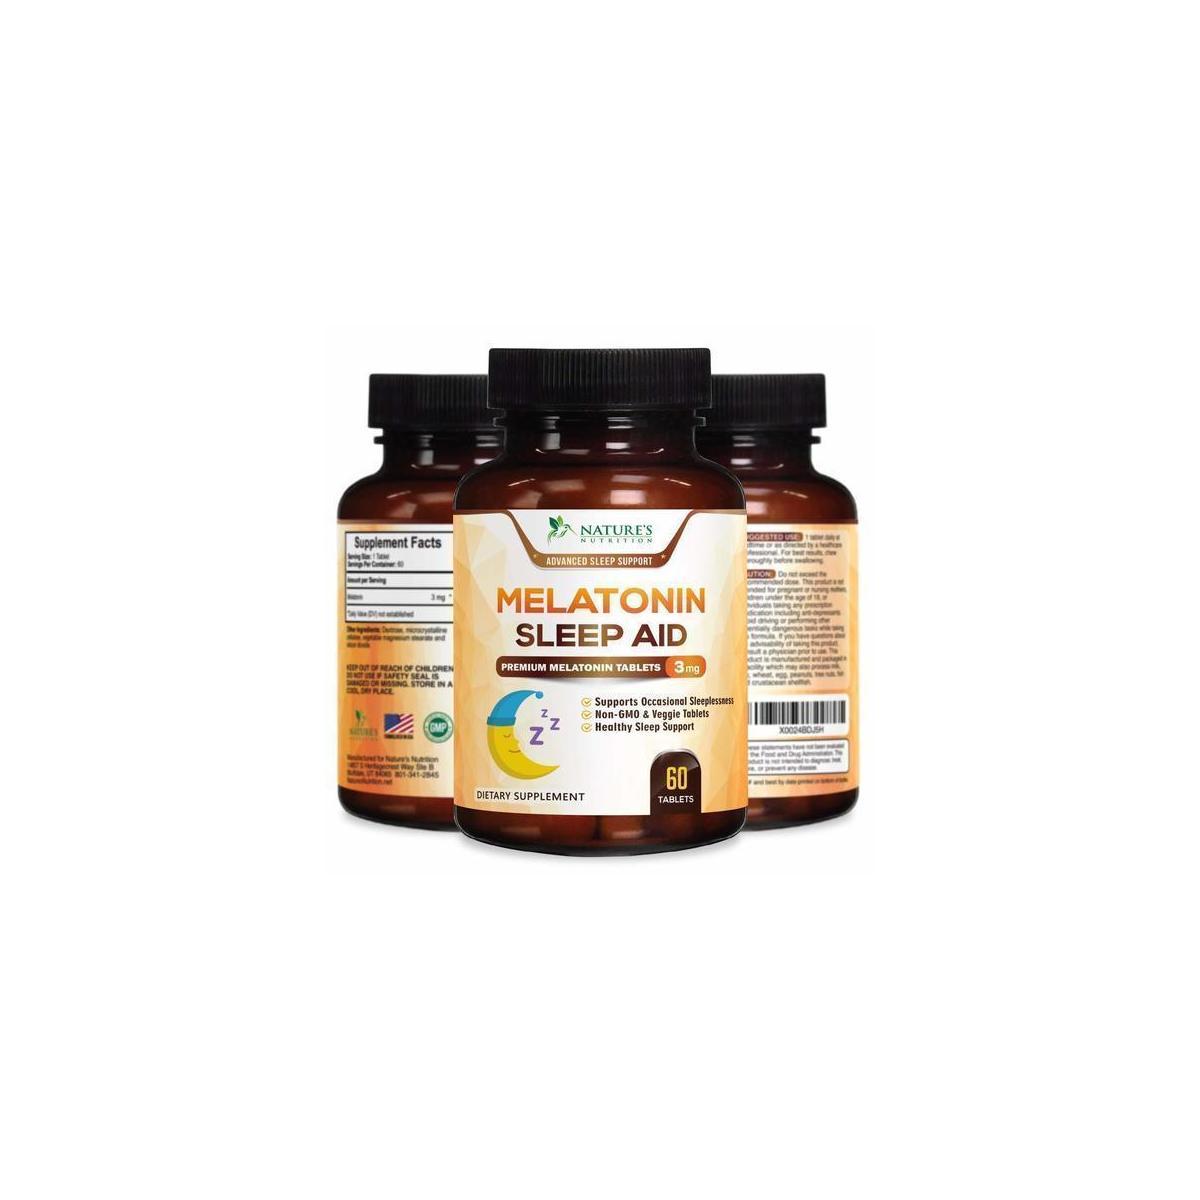 Melatonin Sleep Aid, Extra Strength Sleeping Pills 3mg - Fast Absorption Natural Sleeping Aid Supplement - Fall Asleep Faster & Sleep Longer, Chewable, Quick Dissolving, Drug-Free - 60 Tablets